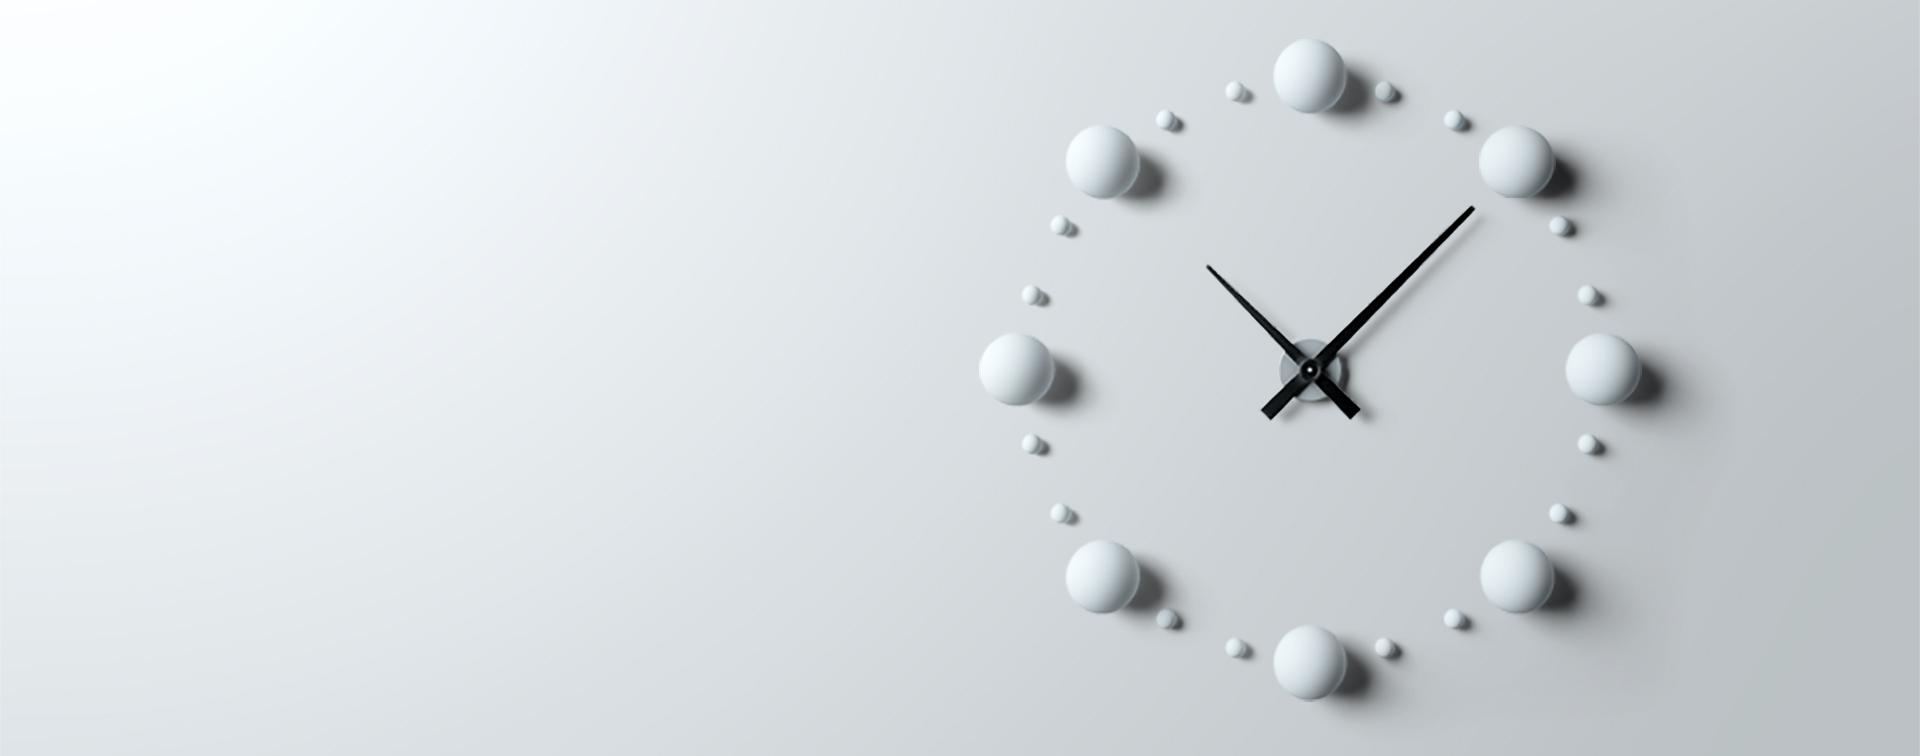 фон с часами для презентации один момент локтев